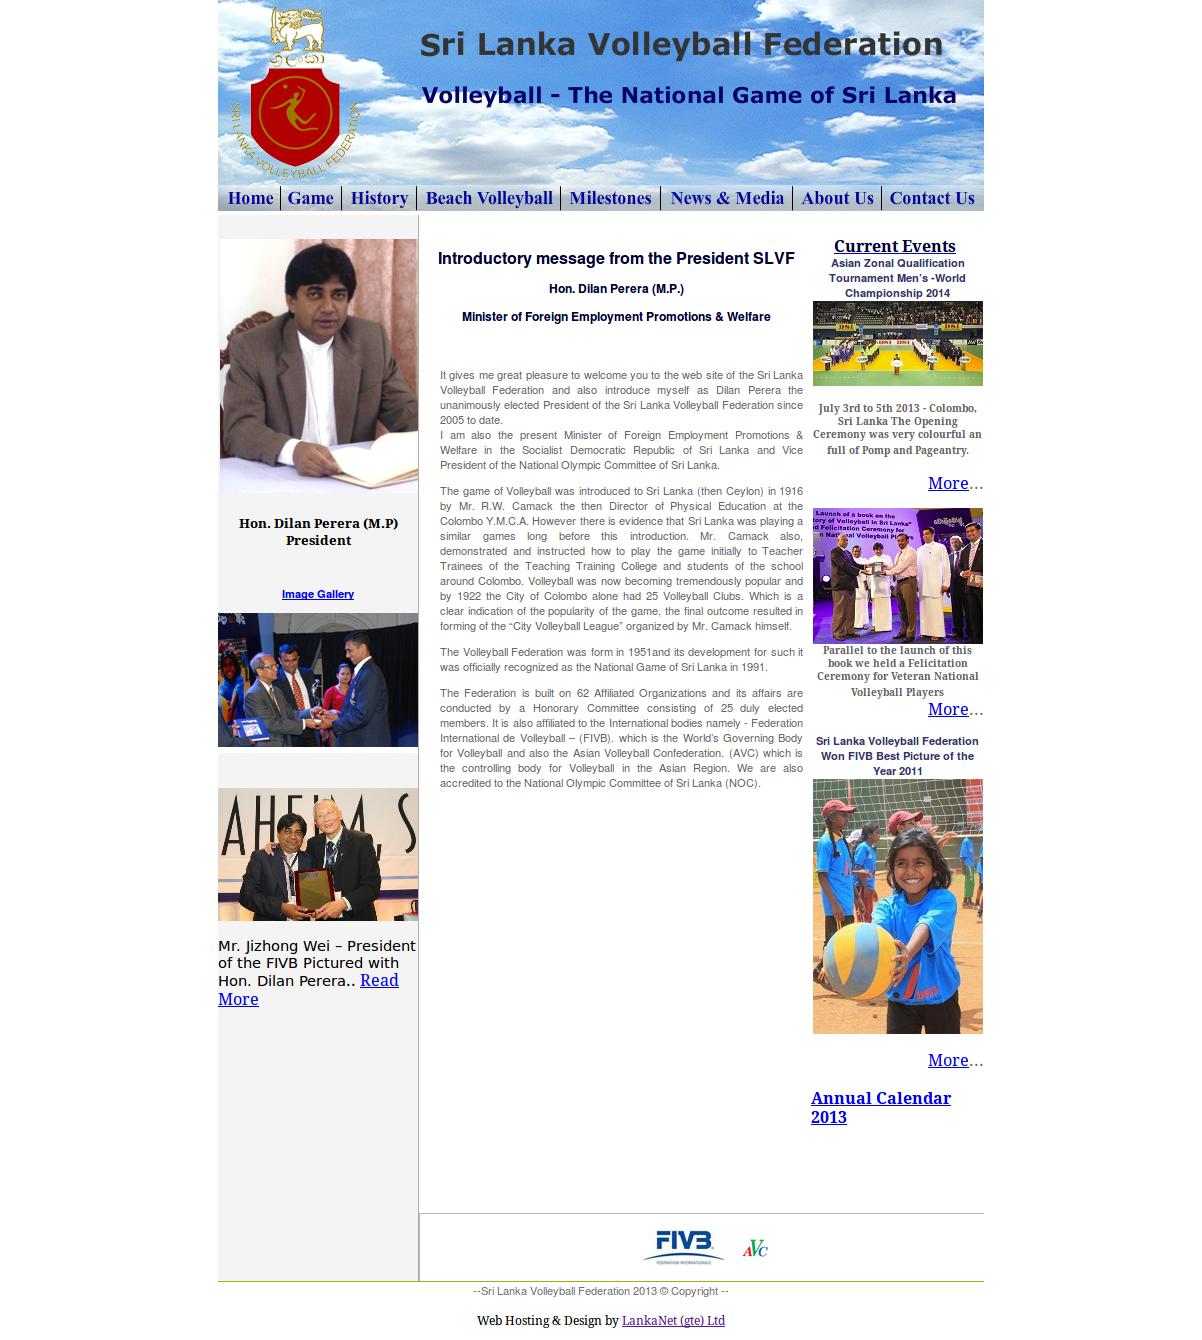 Sri Lanka Volleyball Federation